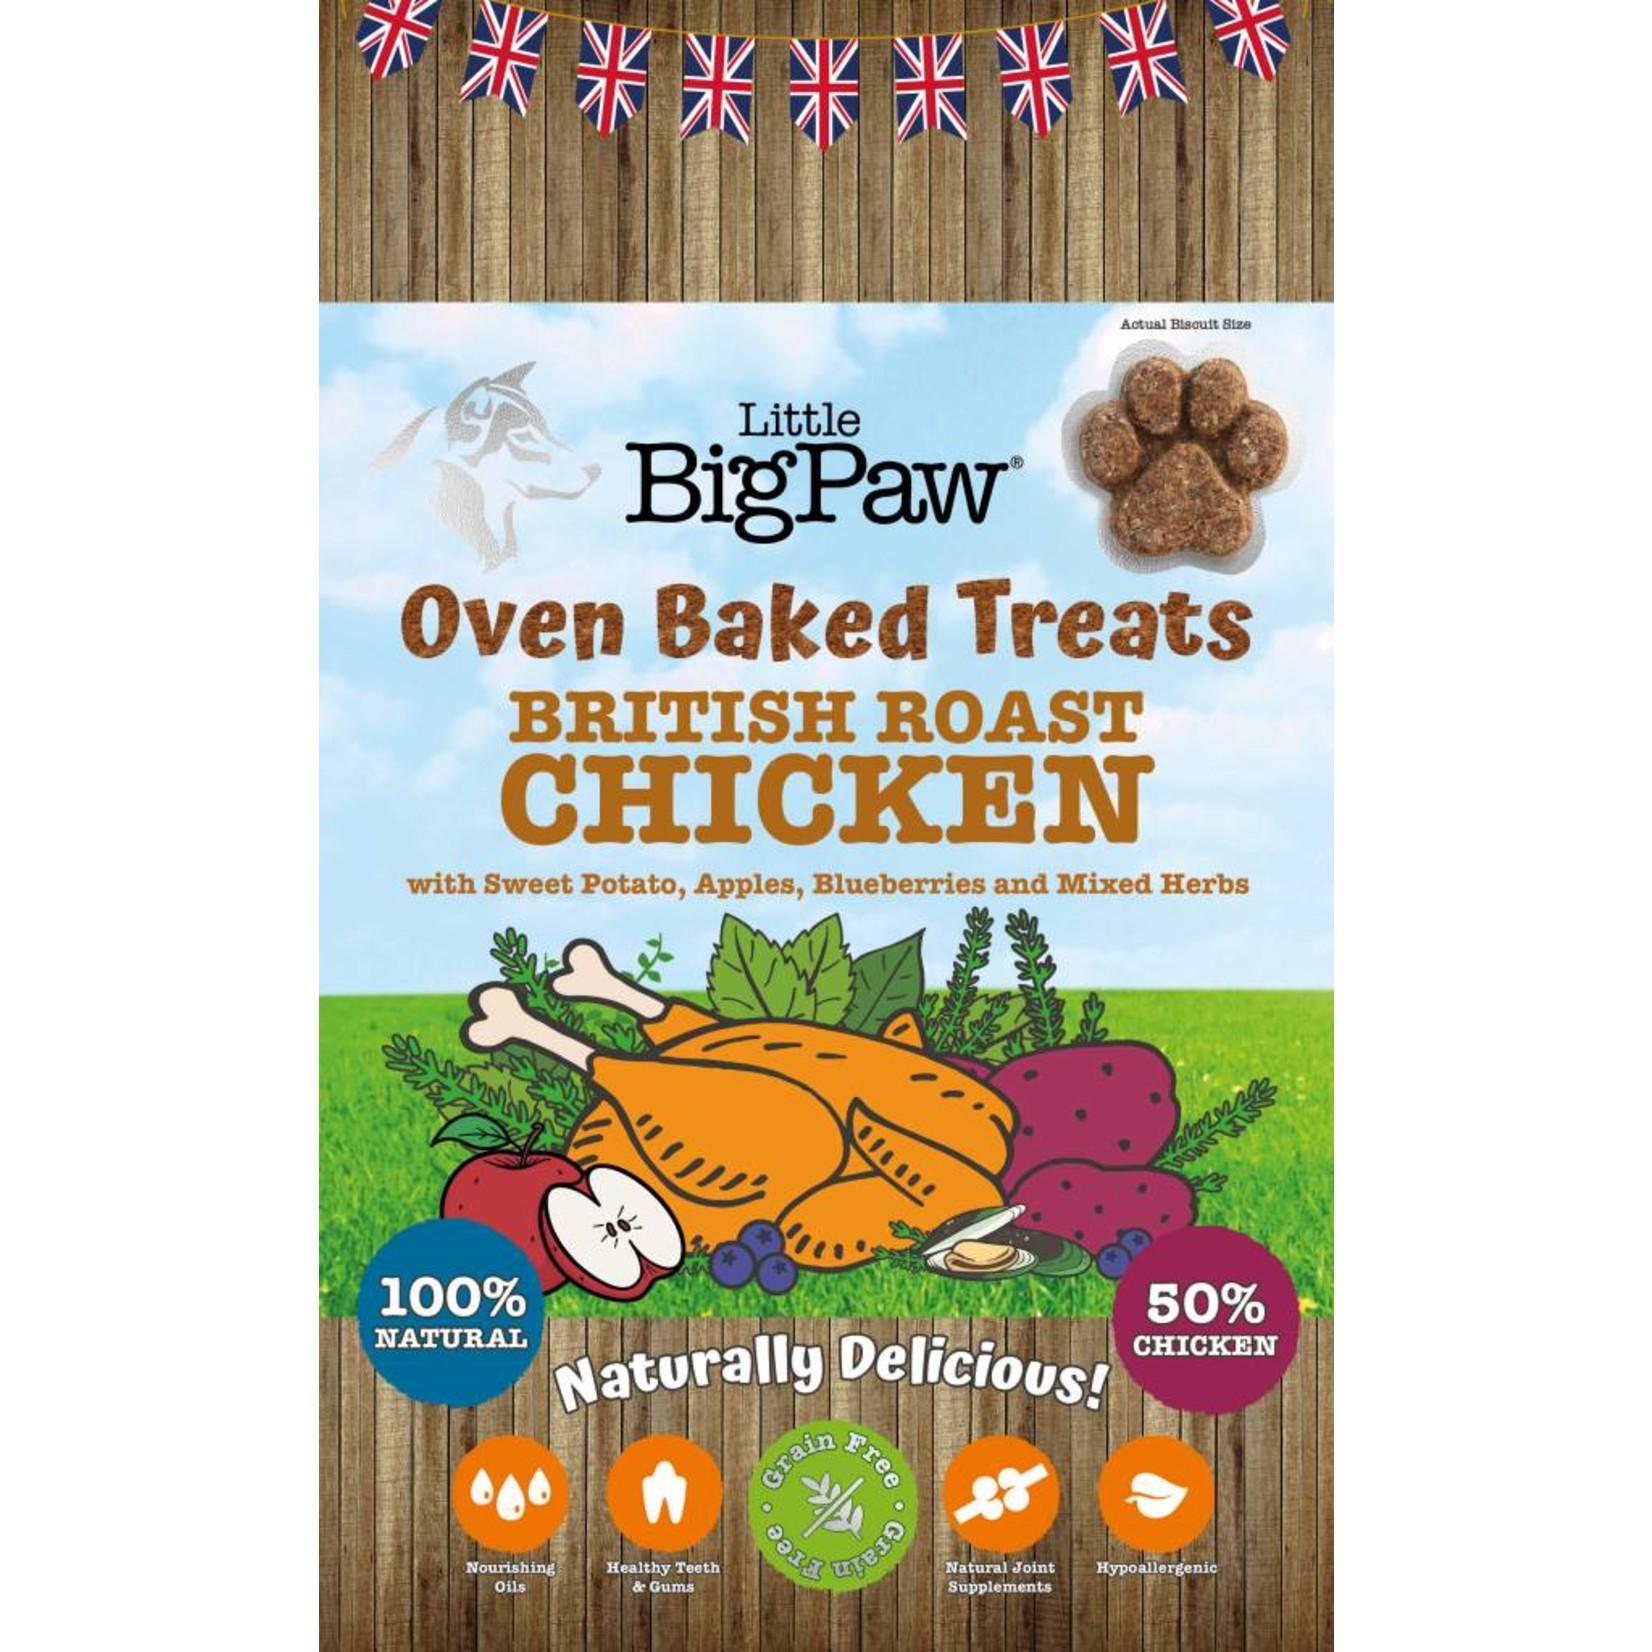 Little BigPaw Oven Baked British Roast Chicken Dog Treats, 130g